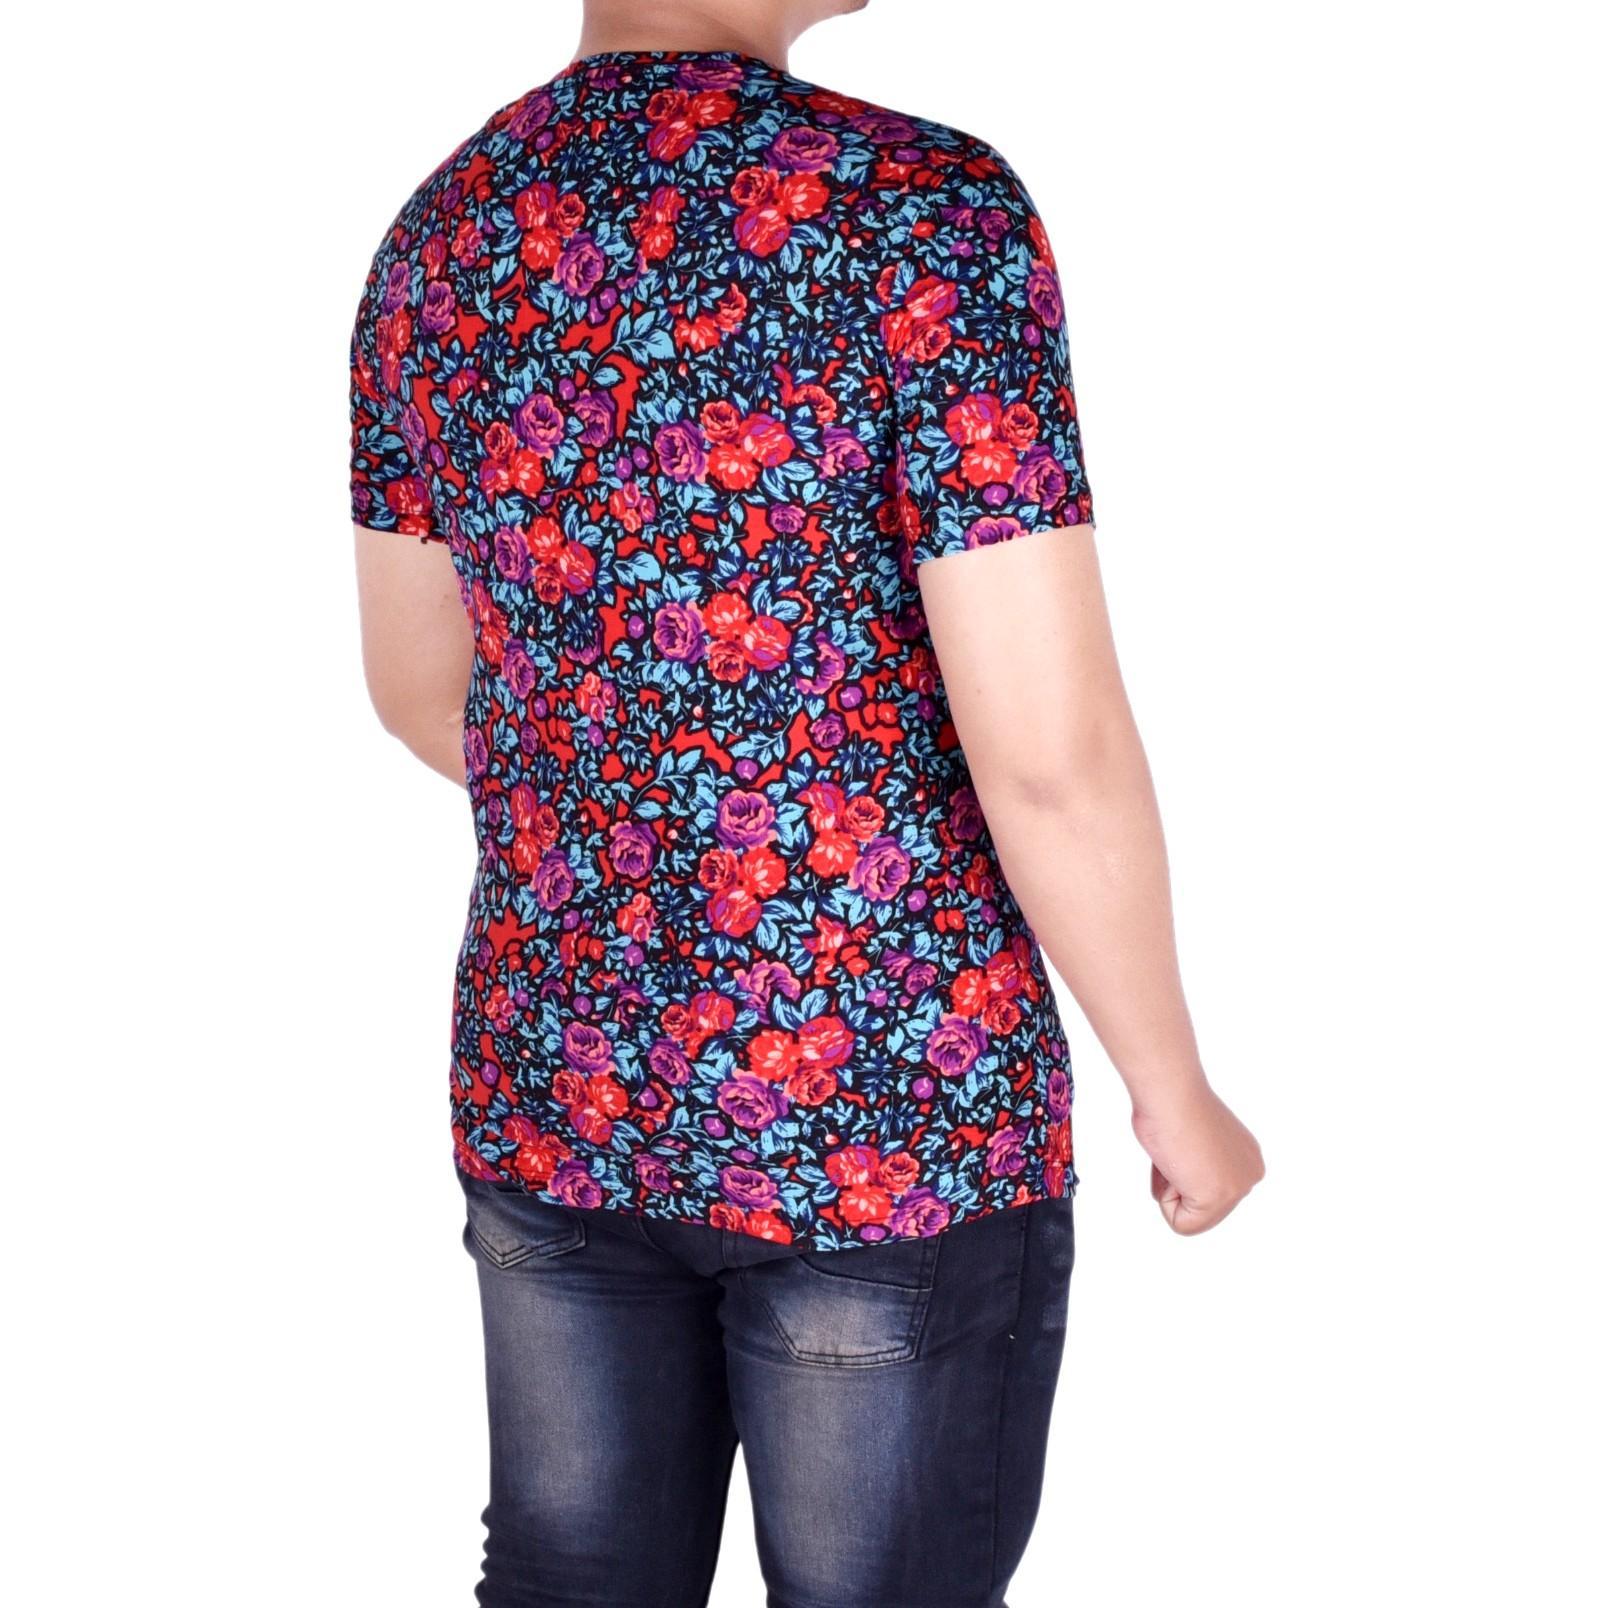 Review Dgm Fashion1 Baju Kaos Distro Murah Bunga Pria Polos Kartun Bermotif Lengan Pendek